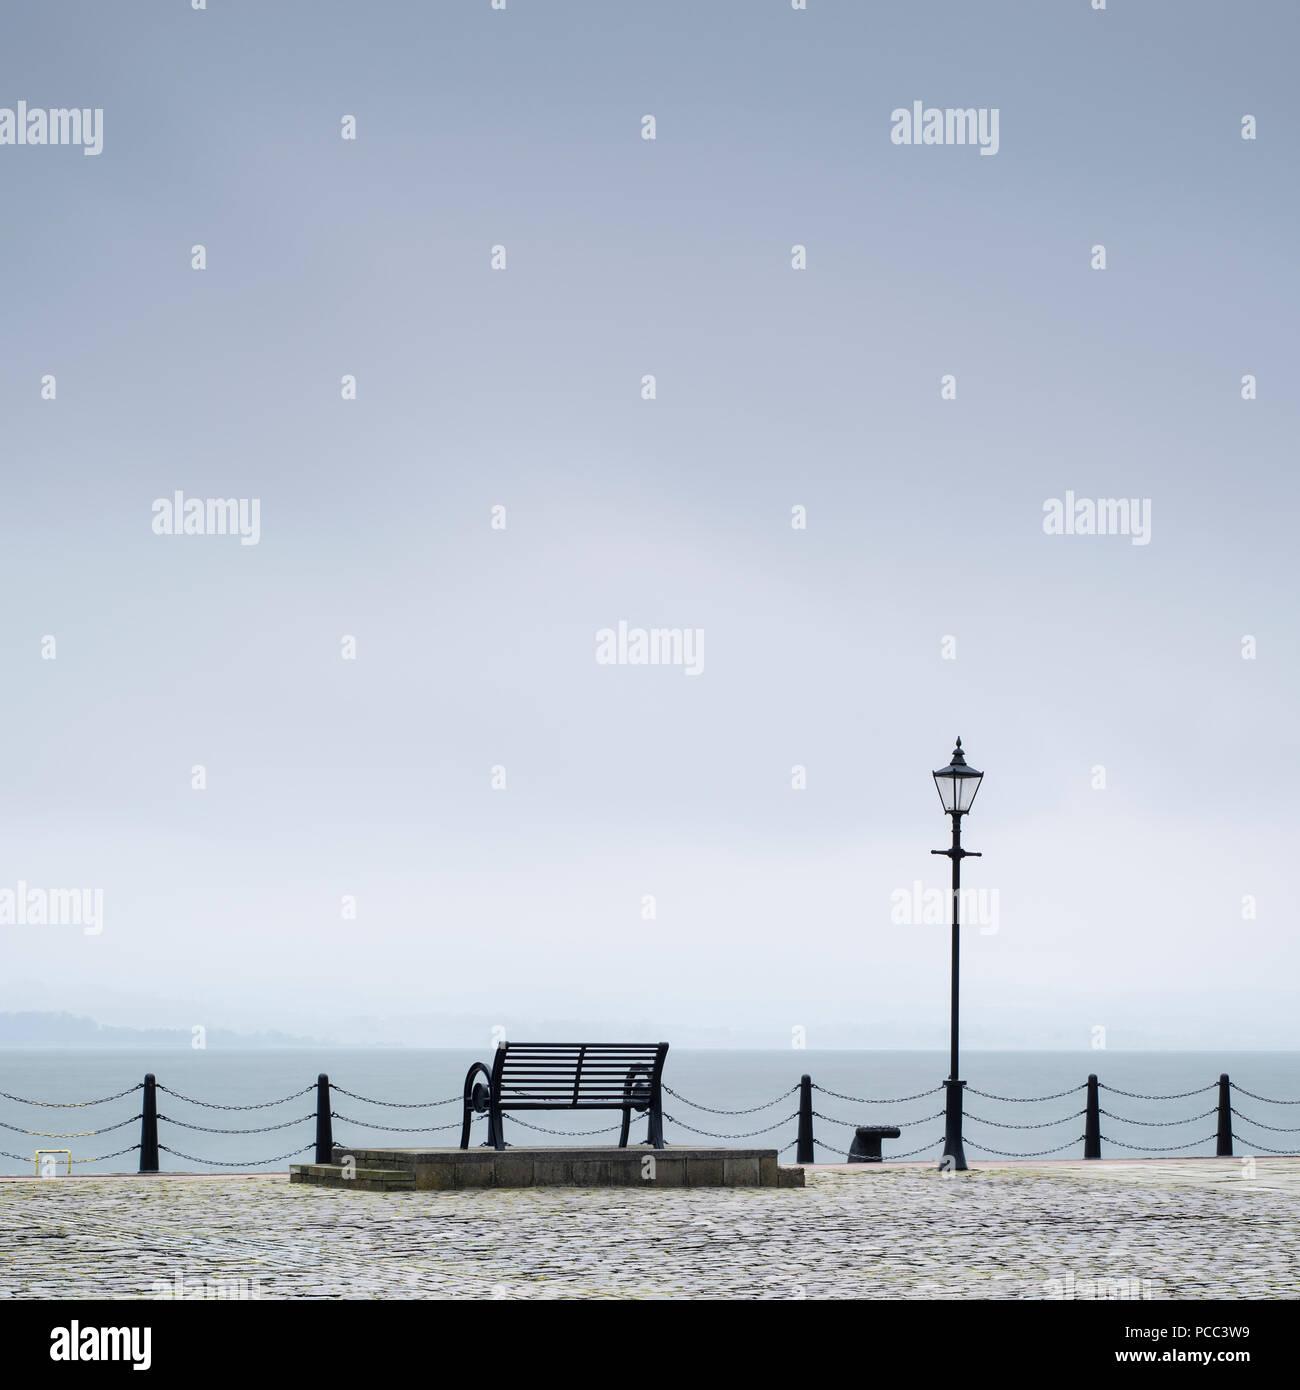 Einsame leere Sitzbank Küste Meer ruhigen Achtsamkeit Szene Stockbild